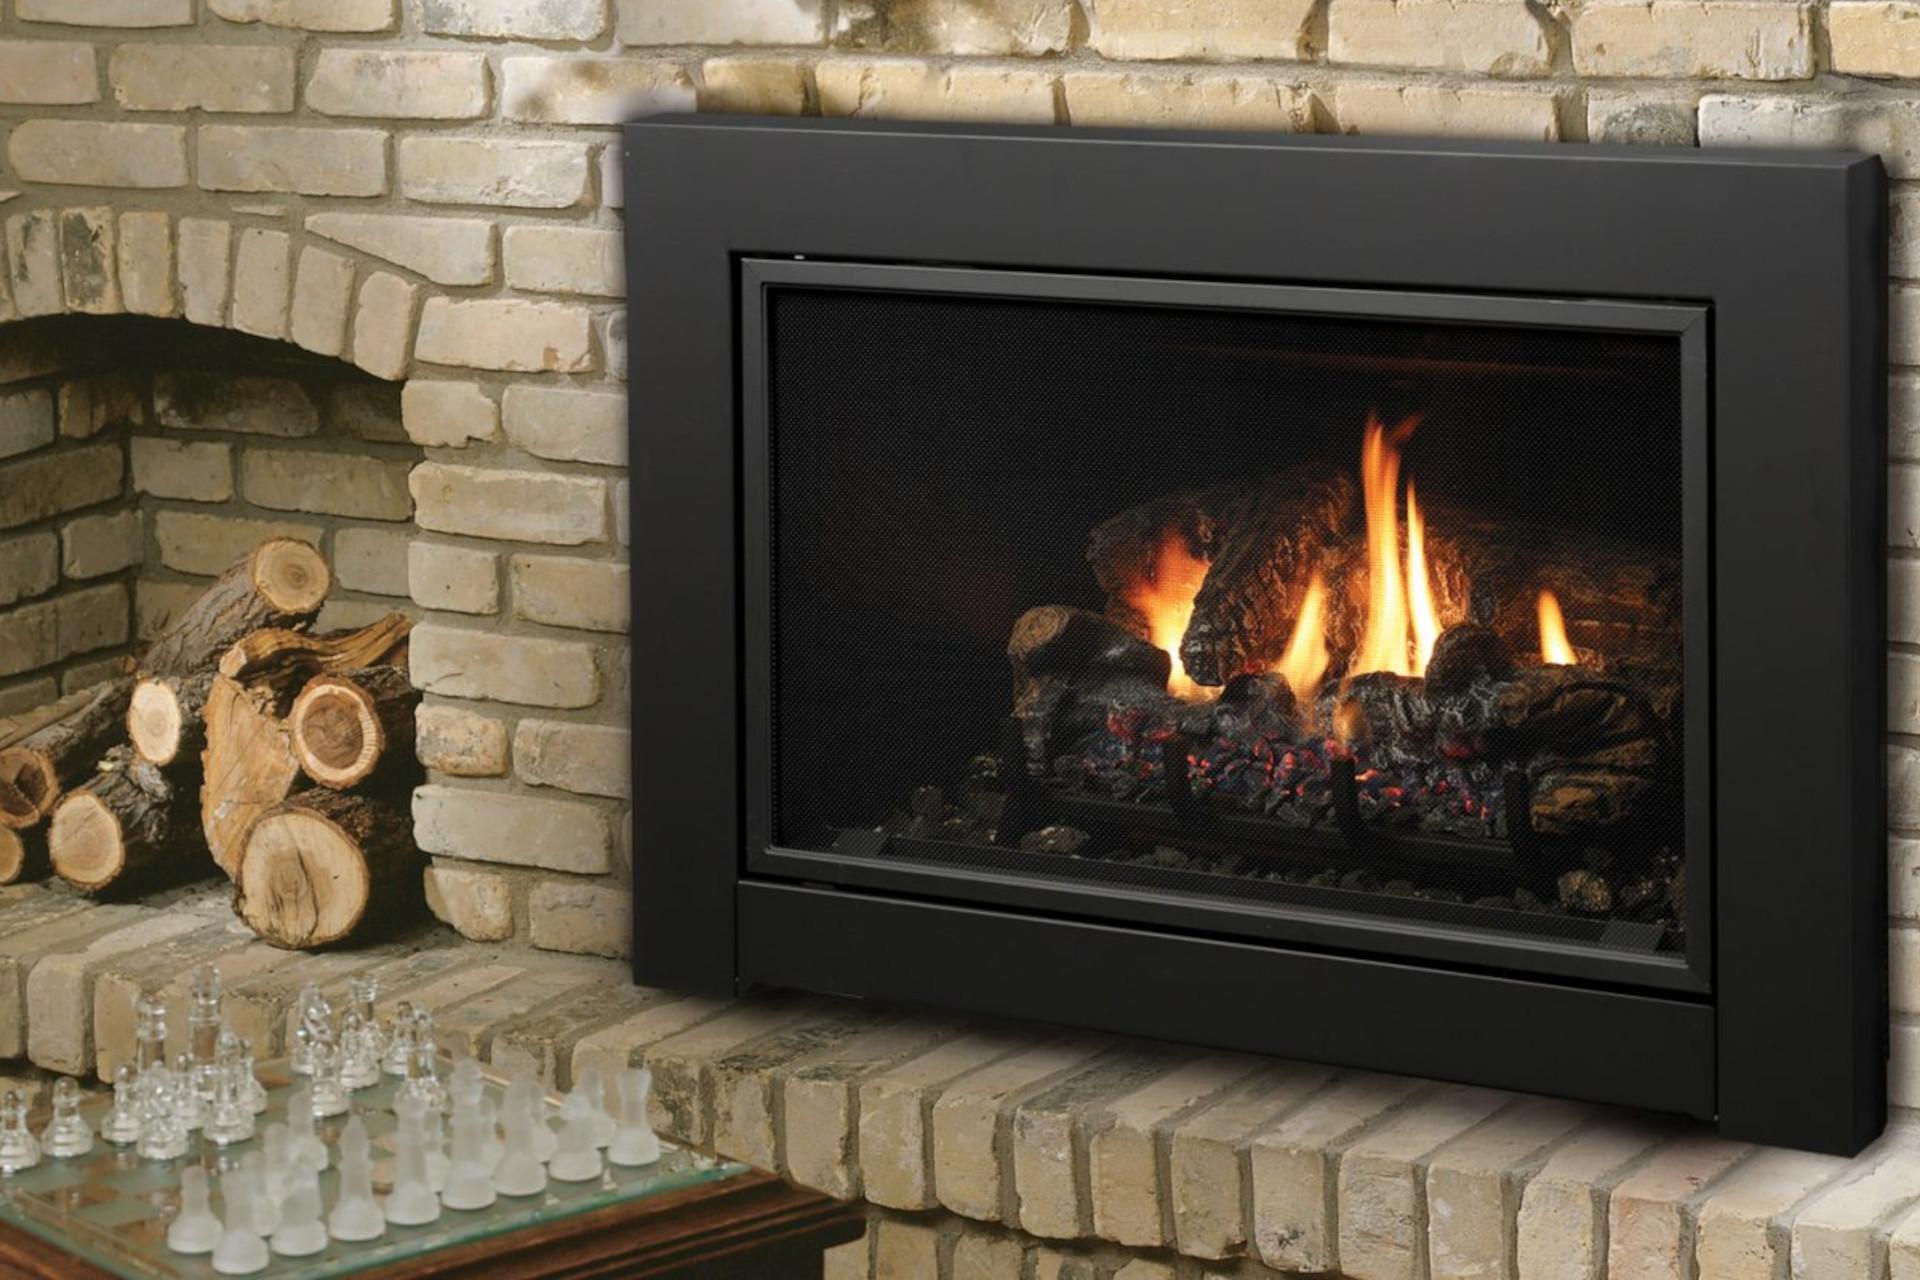 Kingsman IDV33 Fireplace Insert